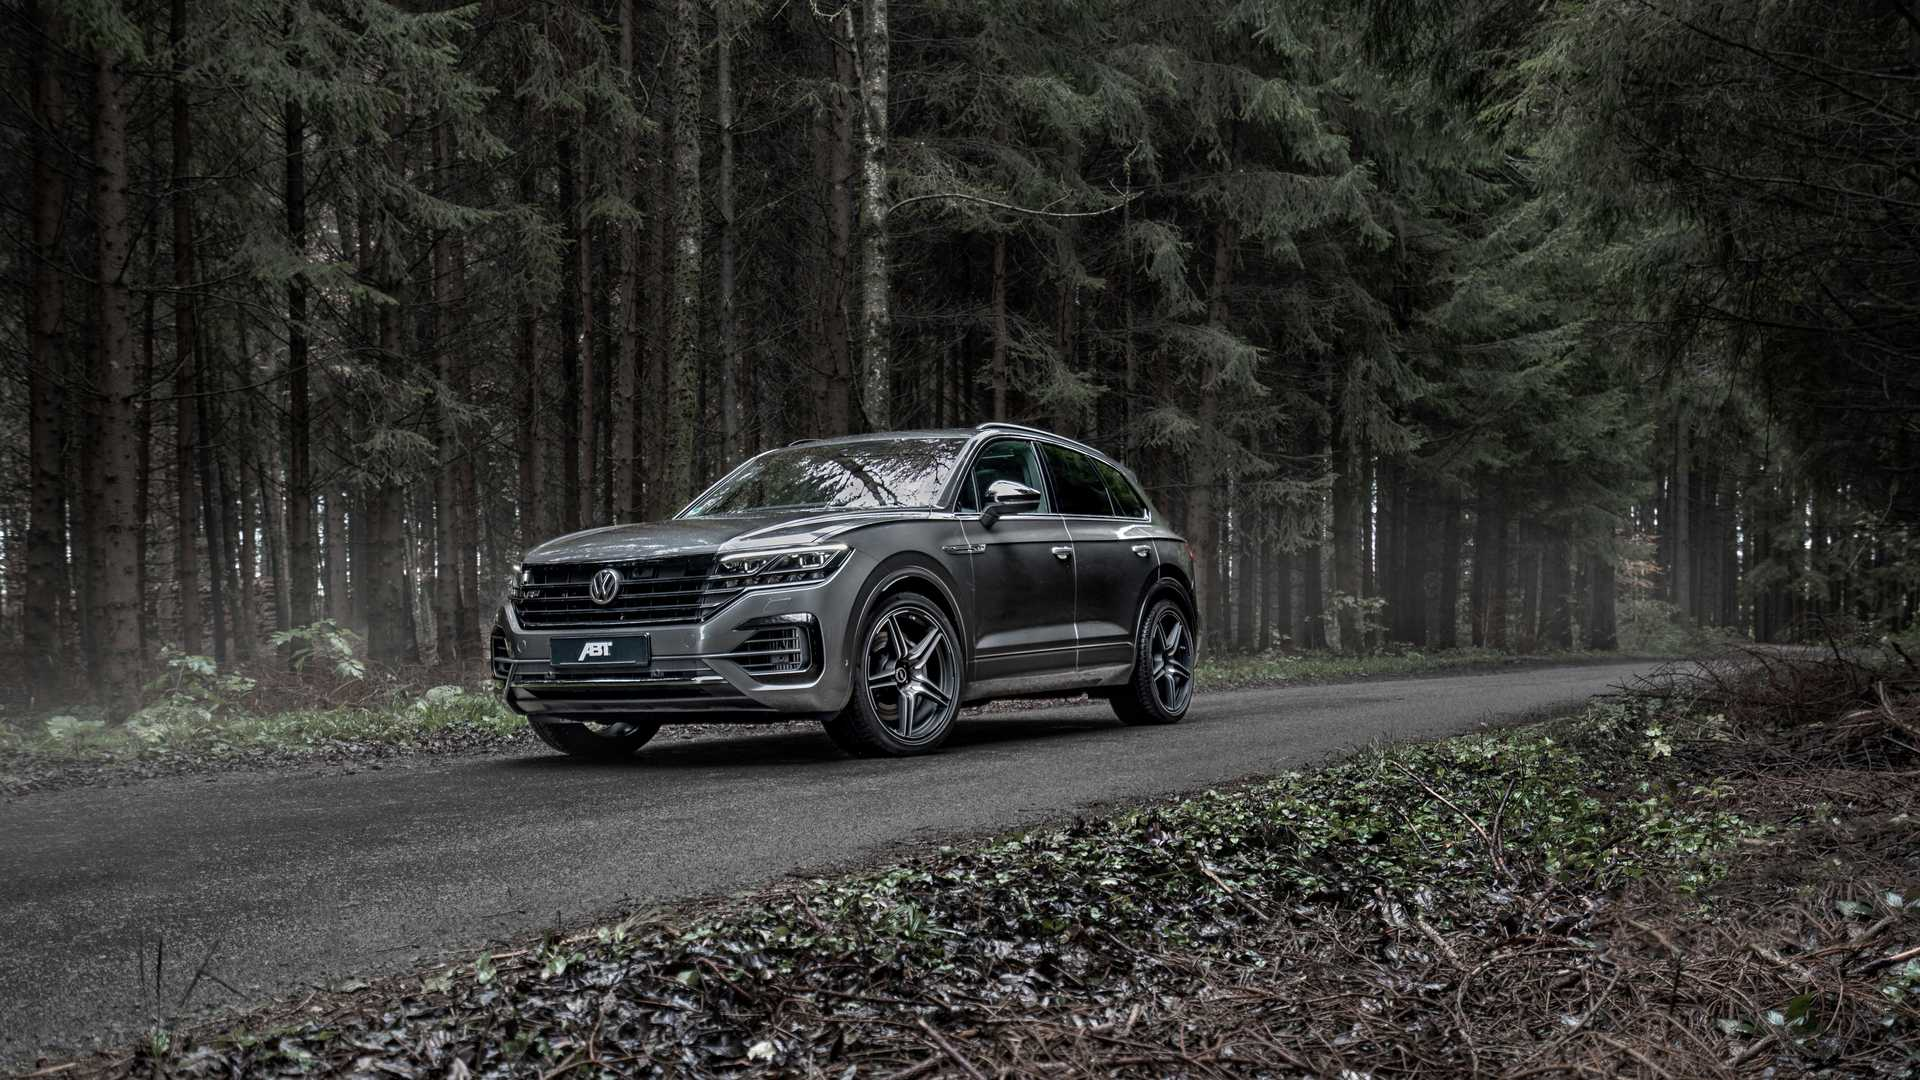 Volkswagen-Touareg-V8-TDI-by-ABT-1